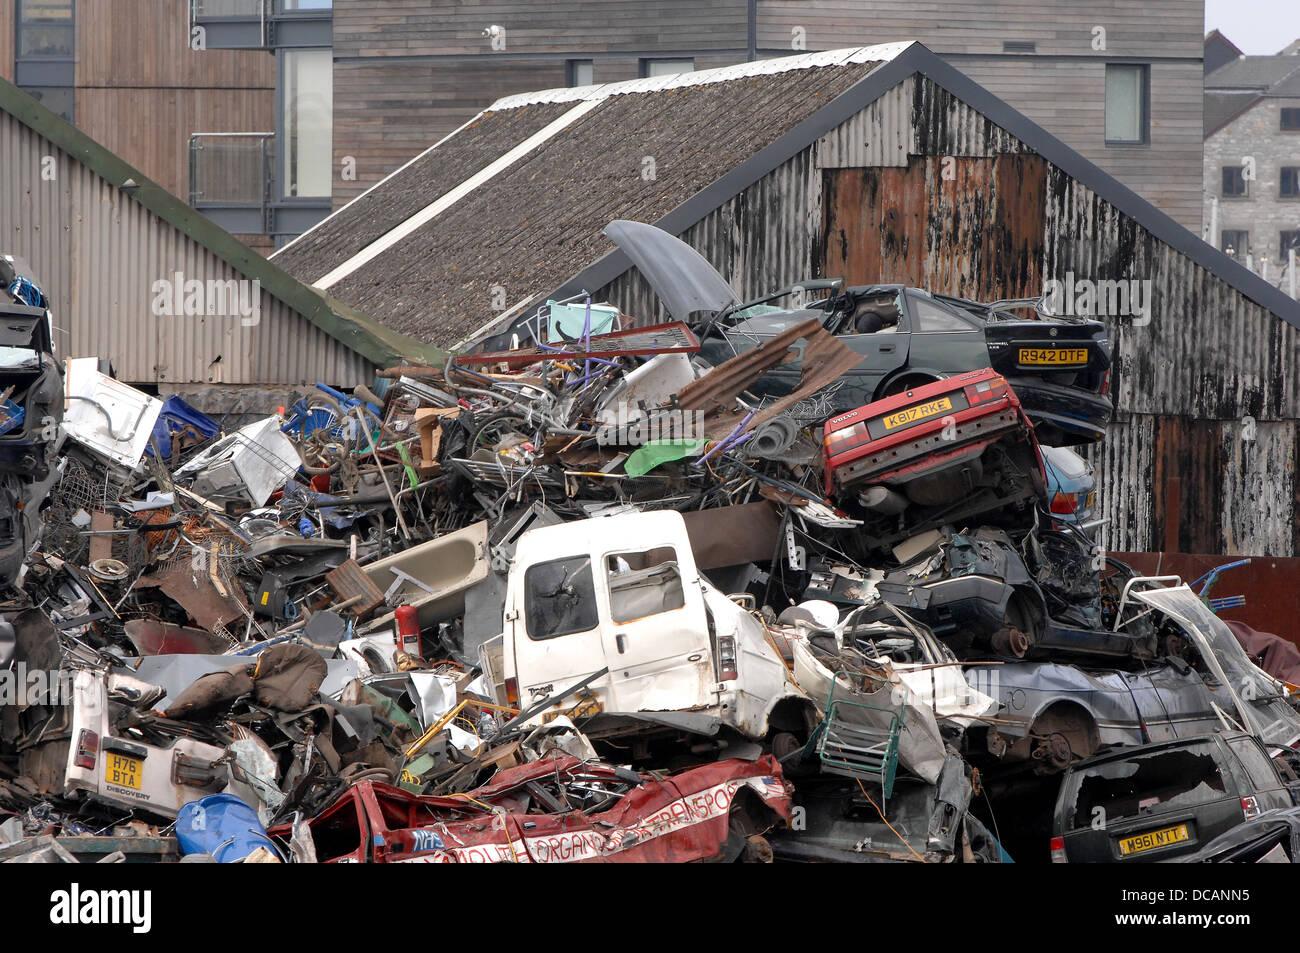 Car Breakers scrap yard in Plymouth Stock Photo: 59243553 - Alamy